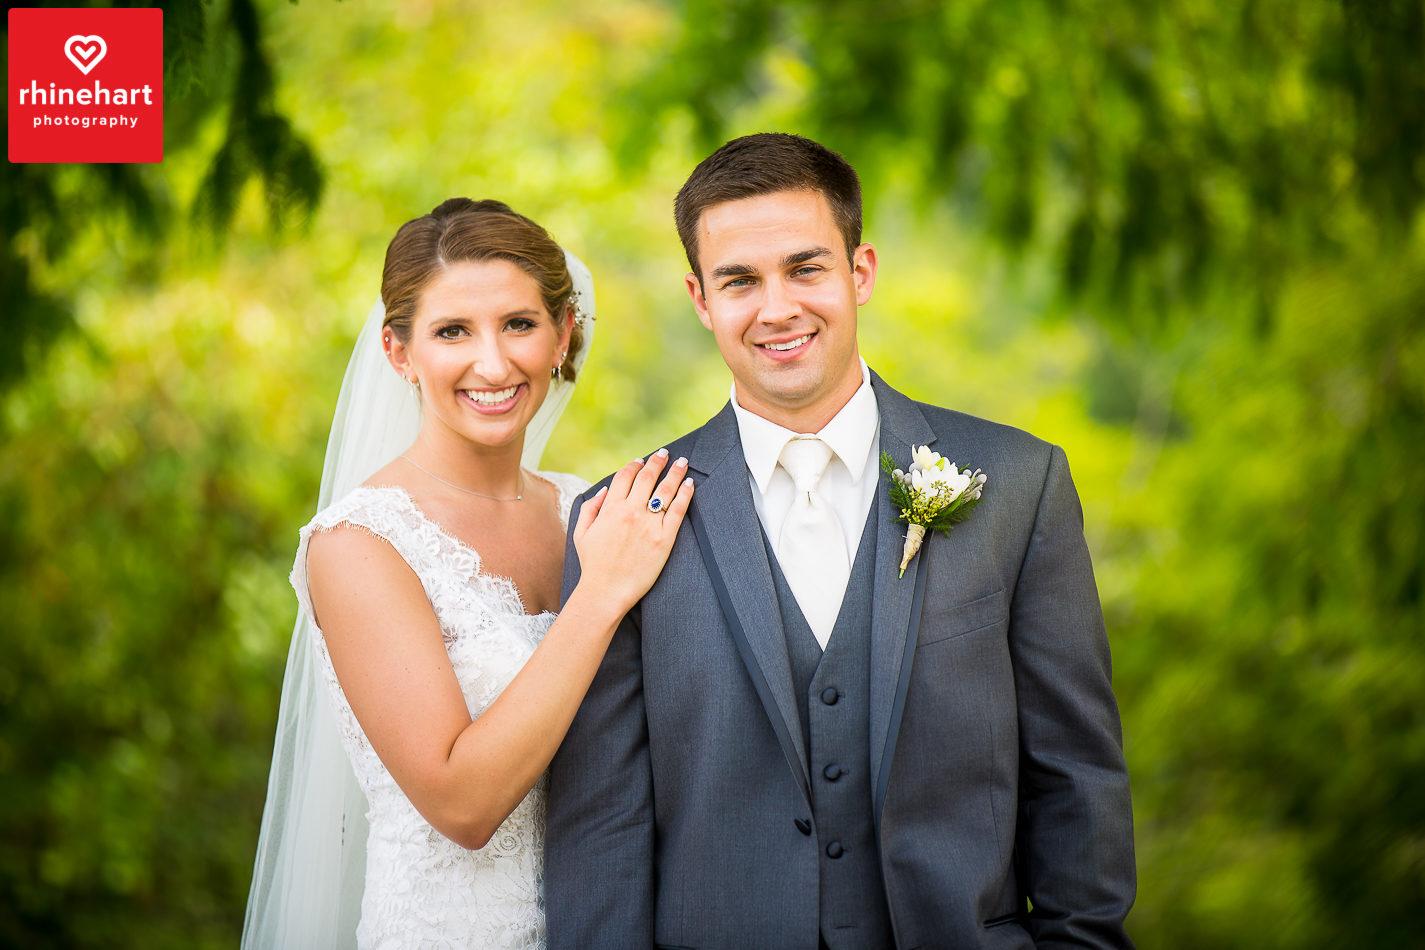 glasbern-inn-wedding-photographer-218